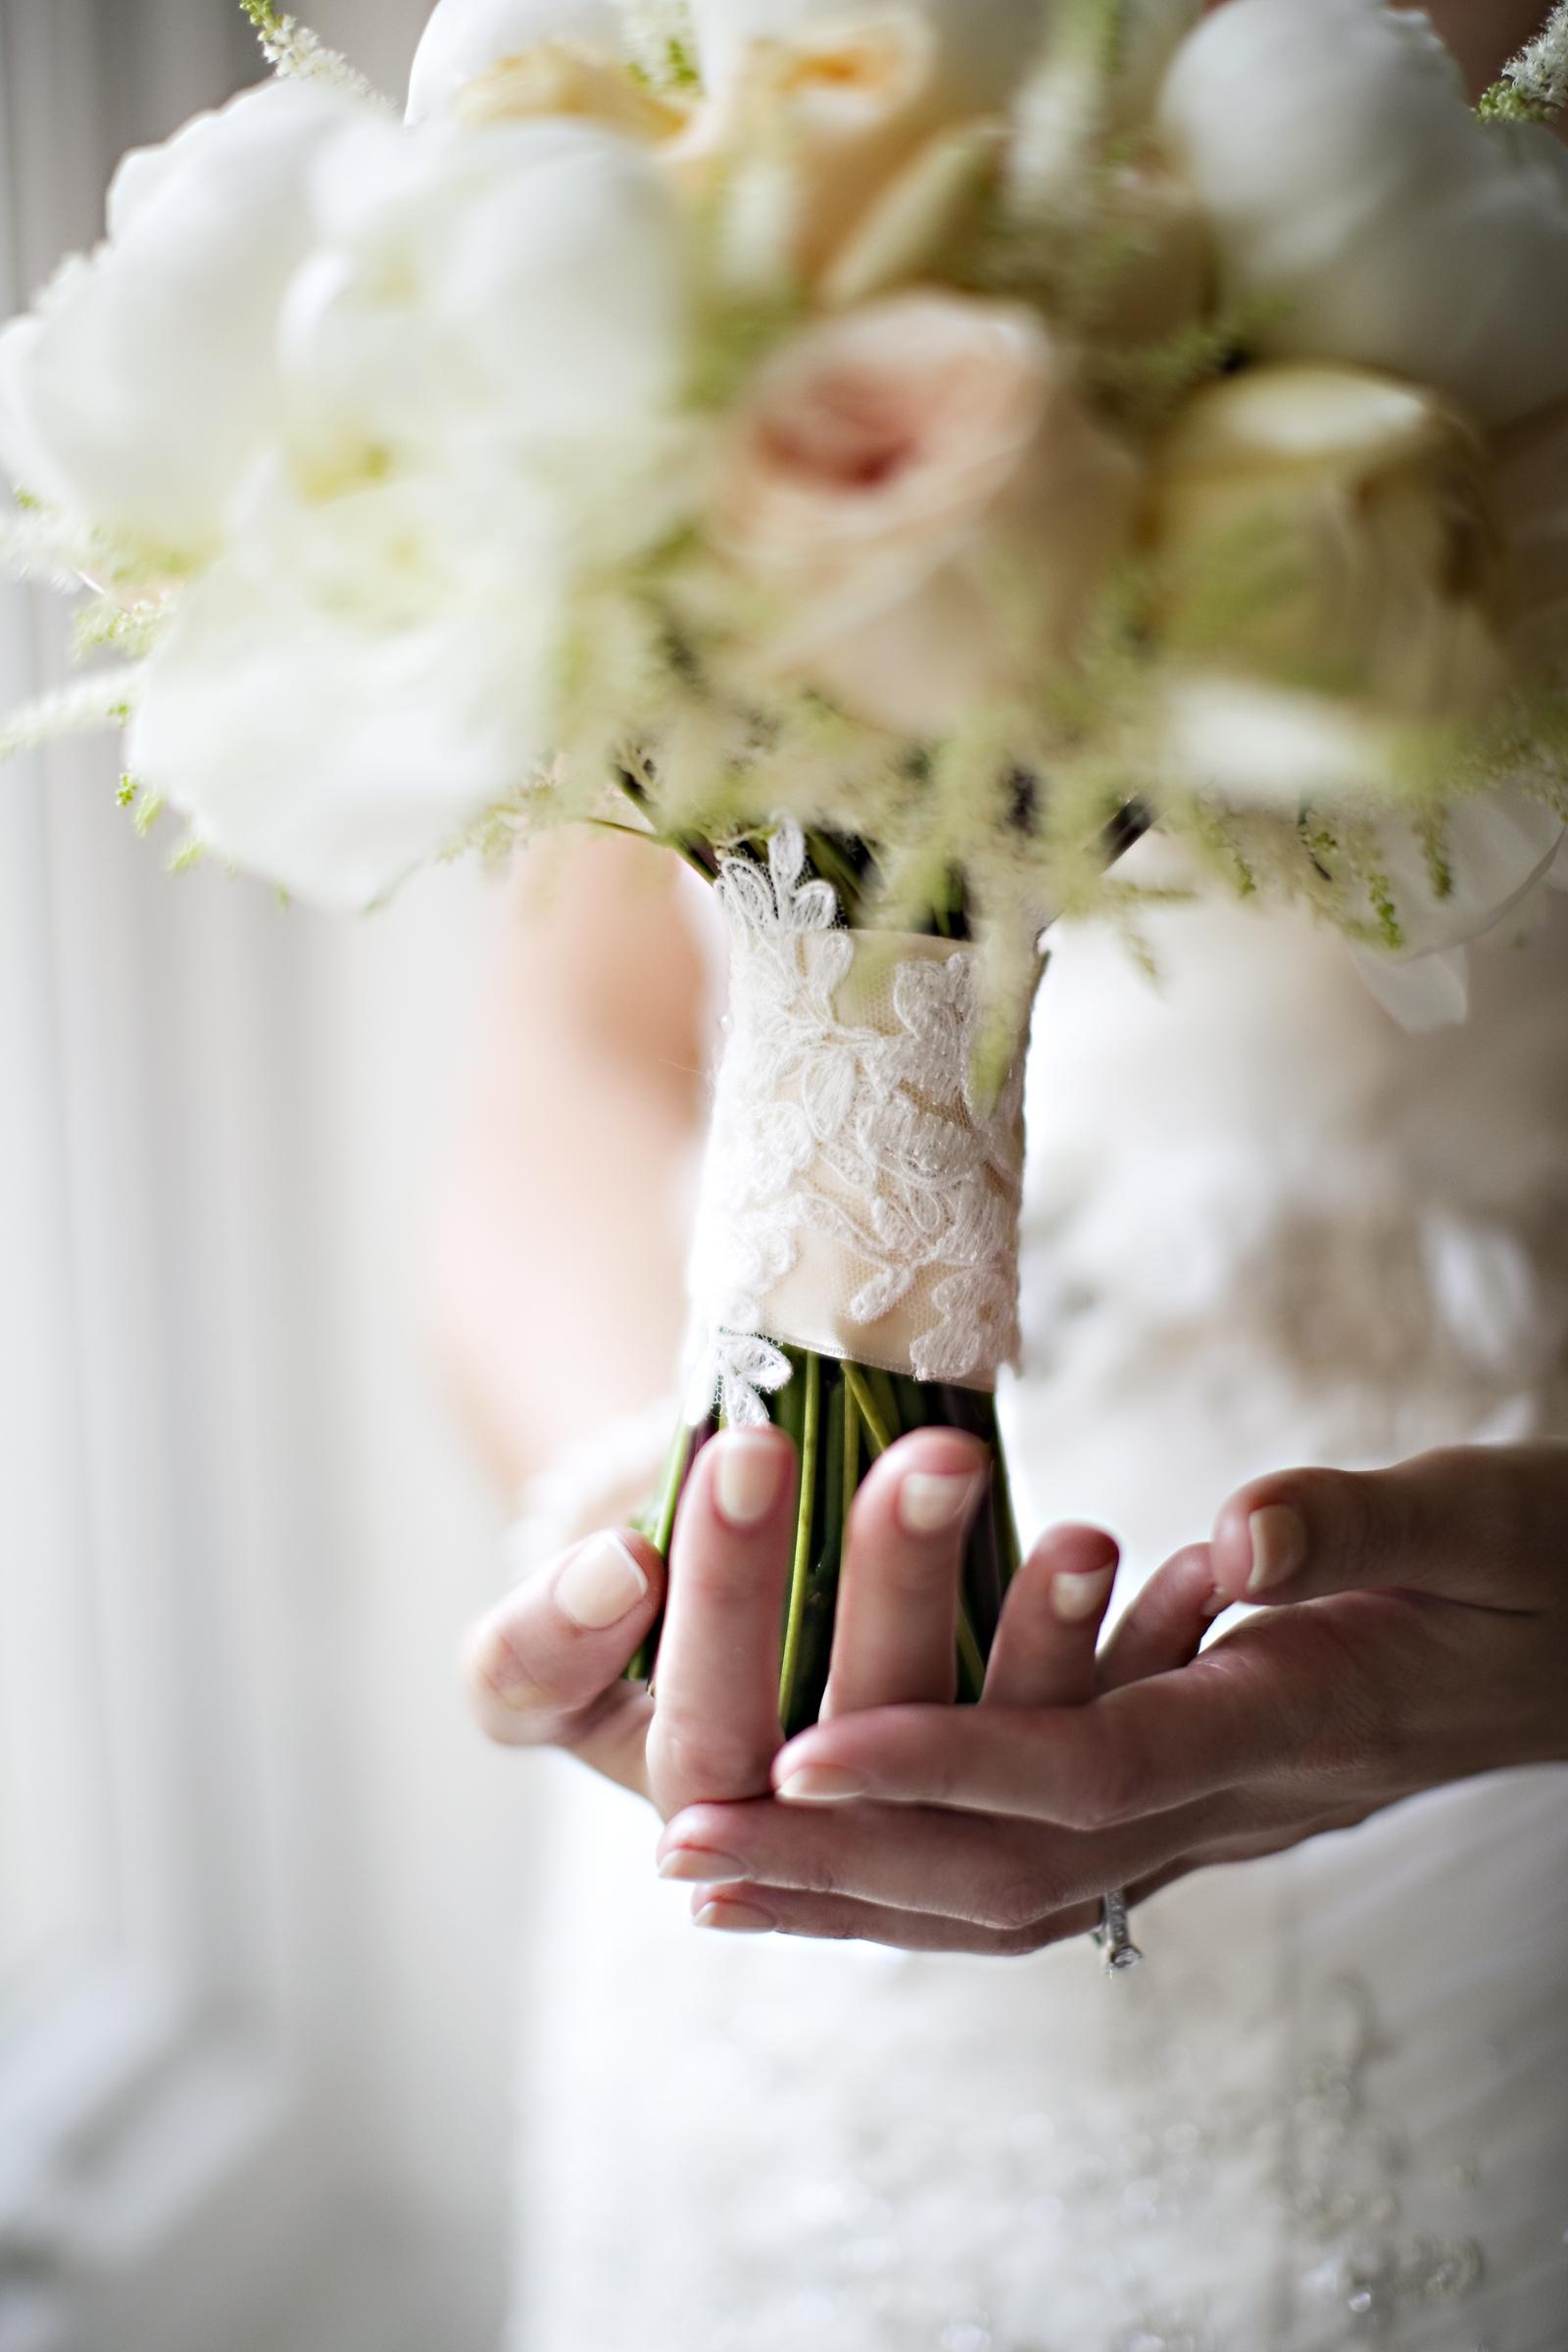 Peony wedding bouquet from Derbyshire florist, Tineke.